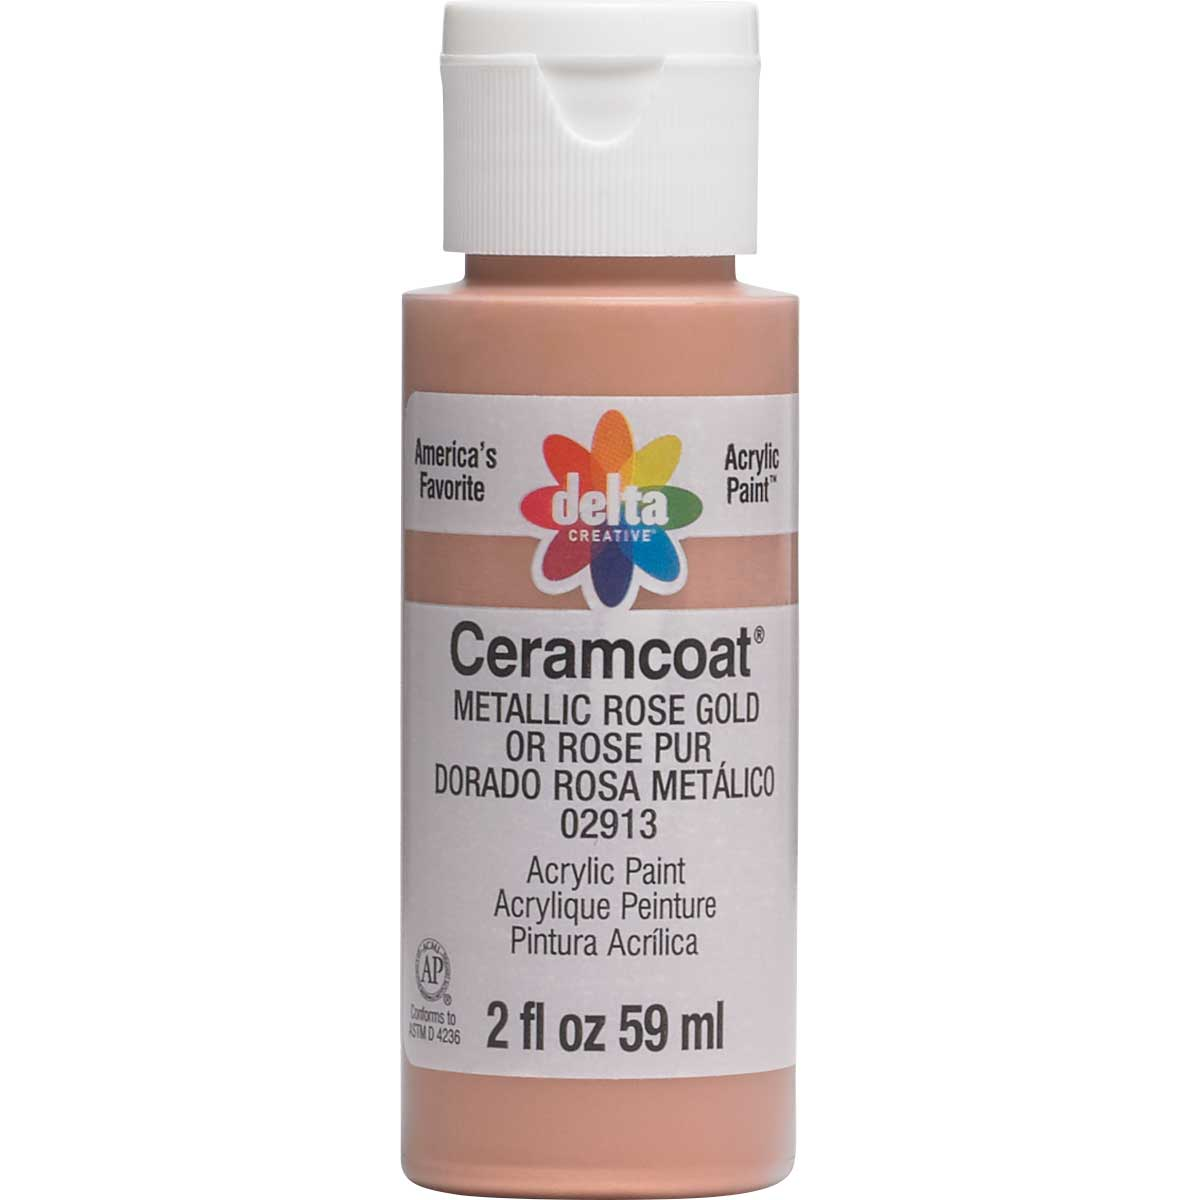 Delta Ceramcoat ® Acrylic Paint - Metallic Rose Gold, 2 oz. - 02913